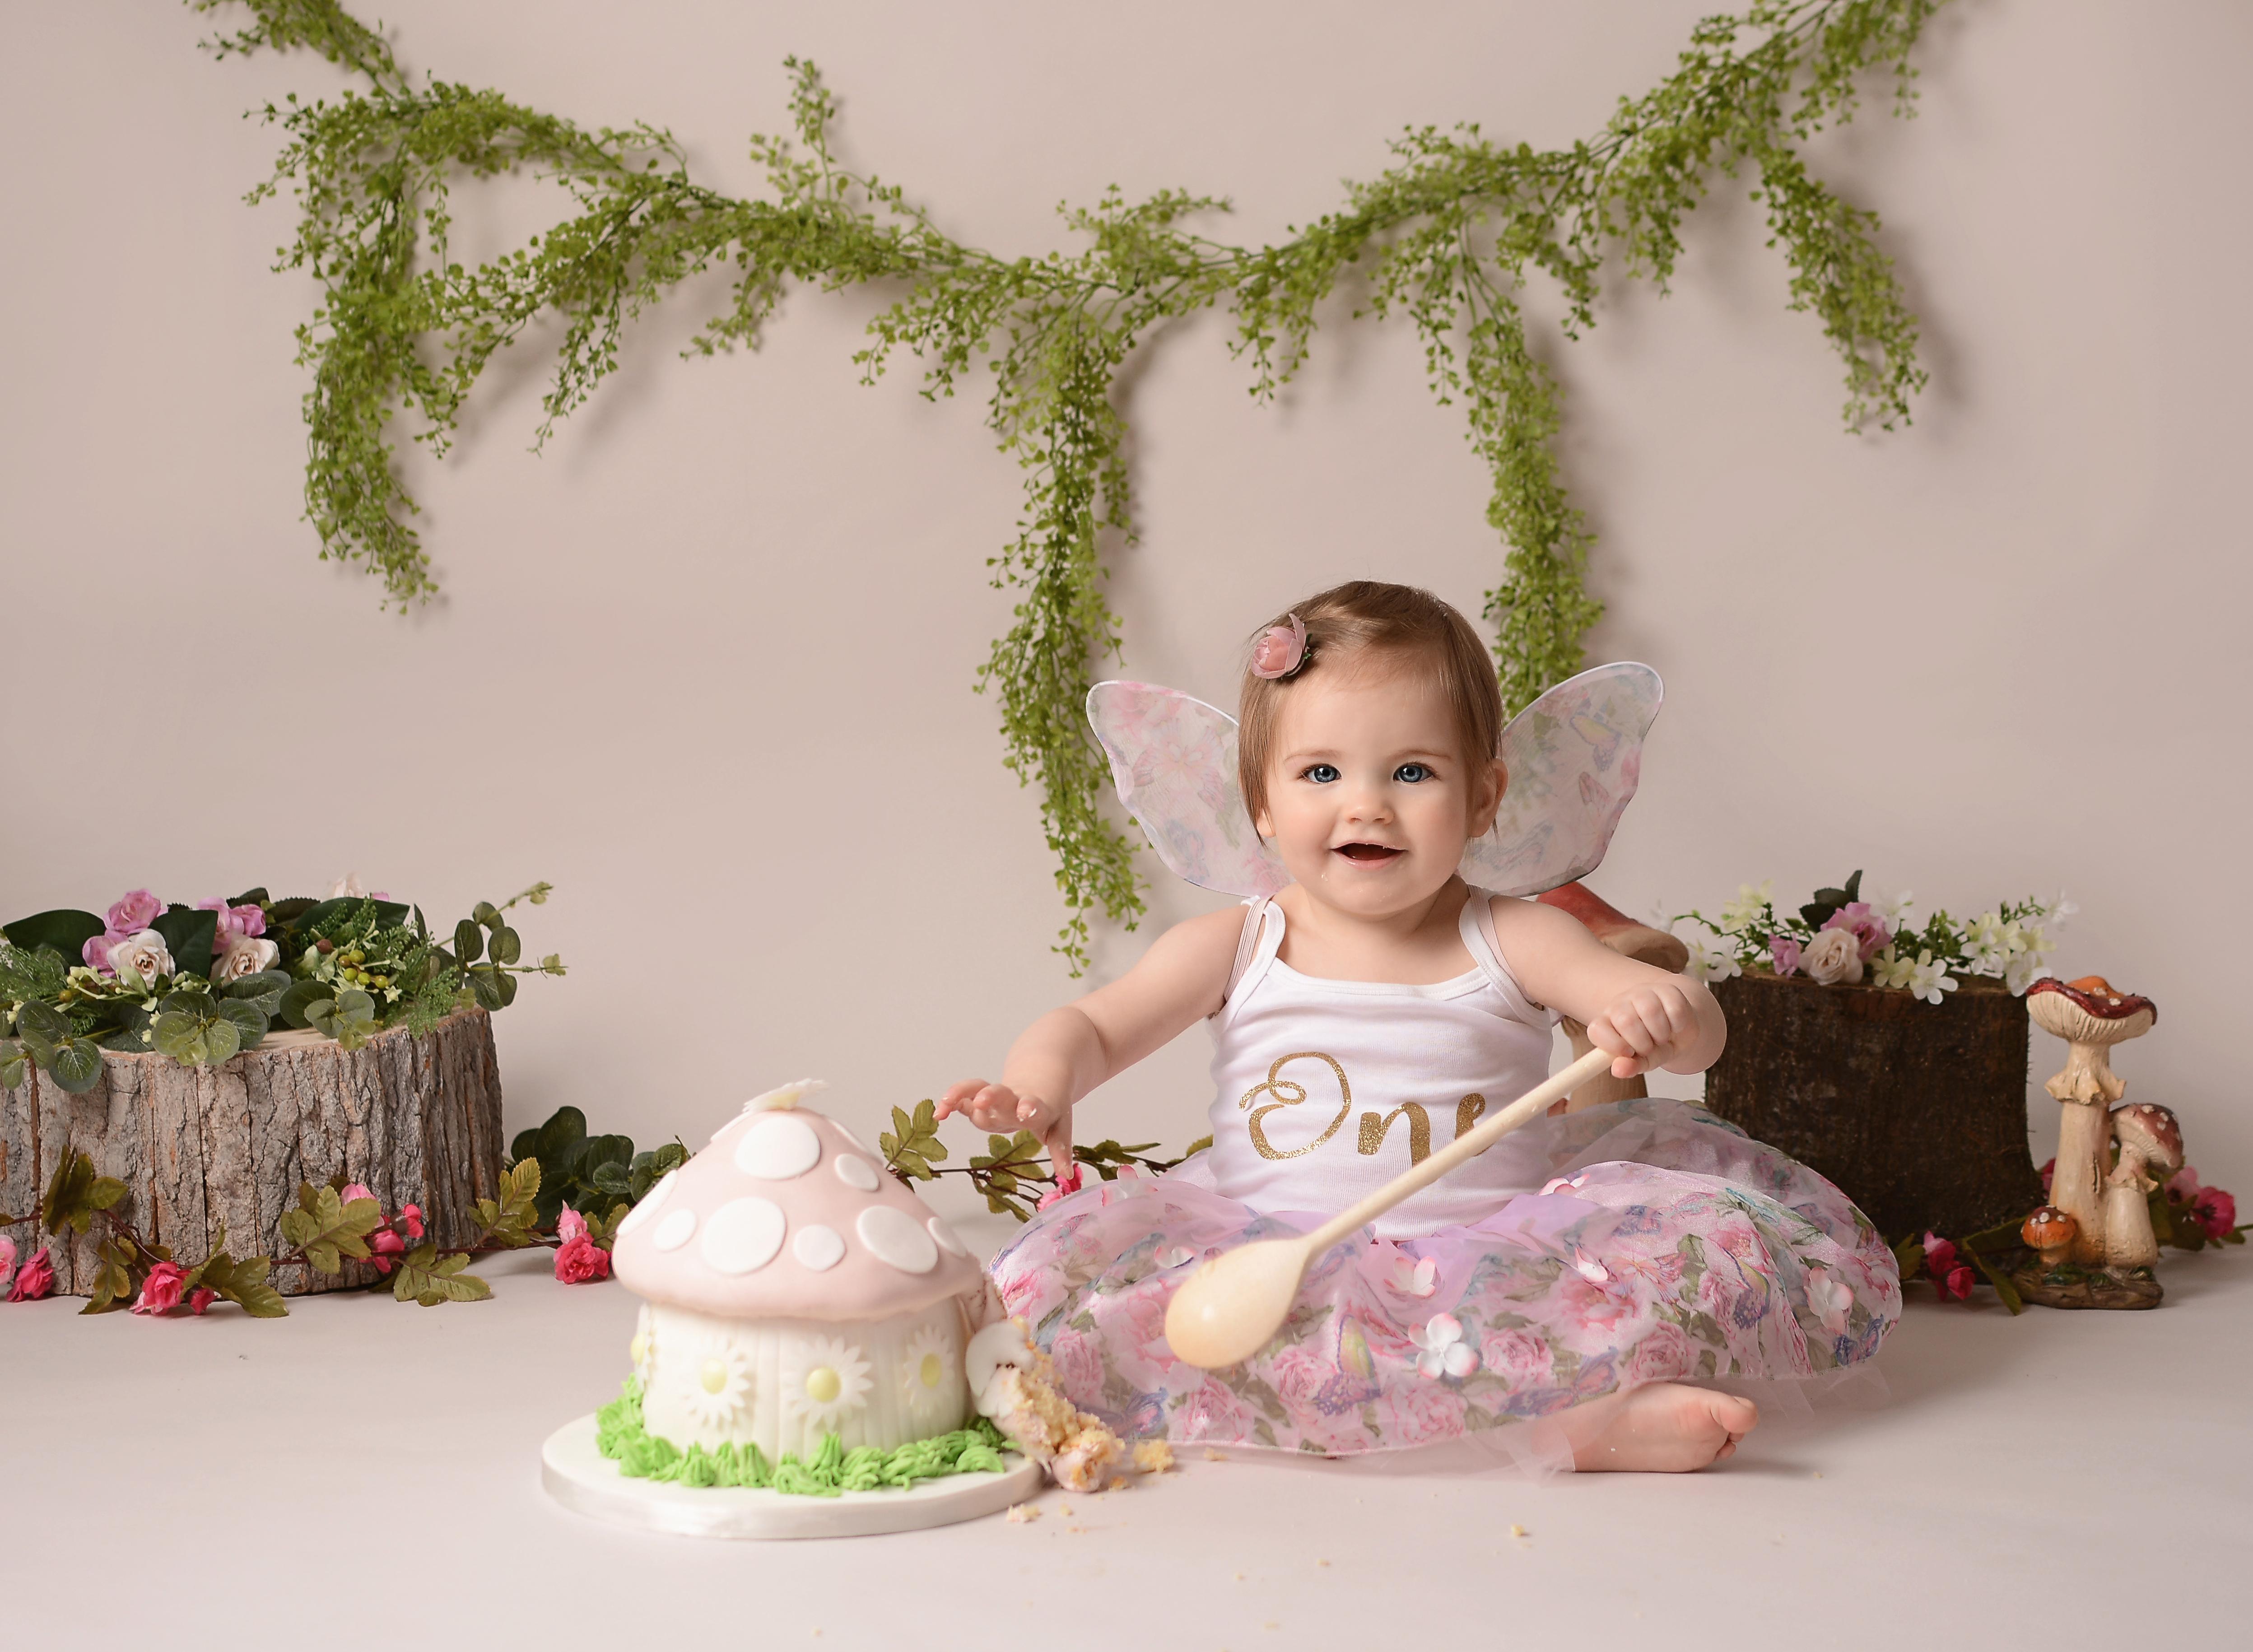 Fairy cake smash